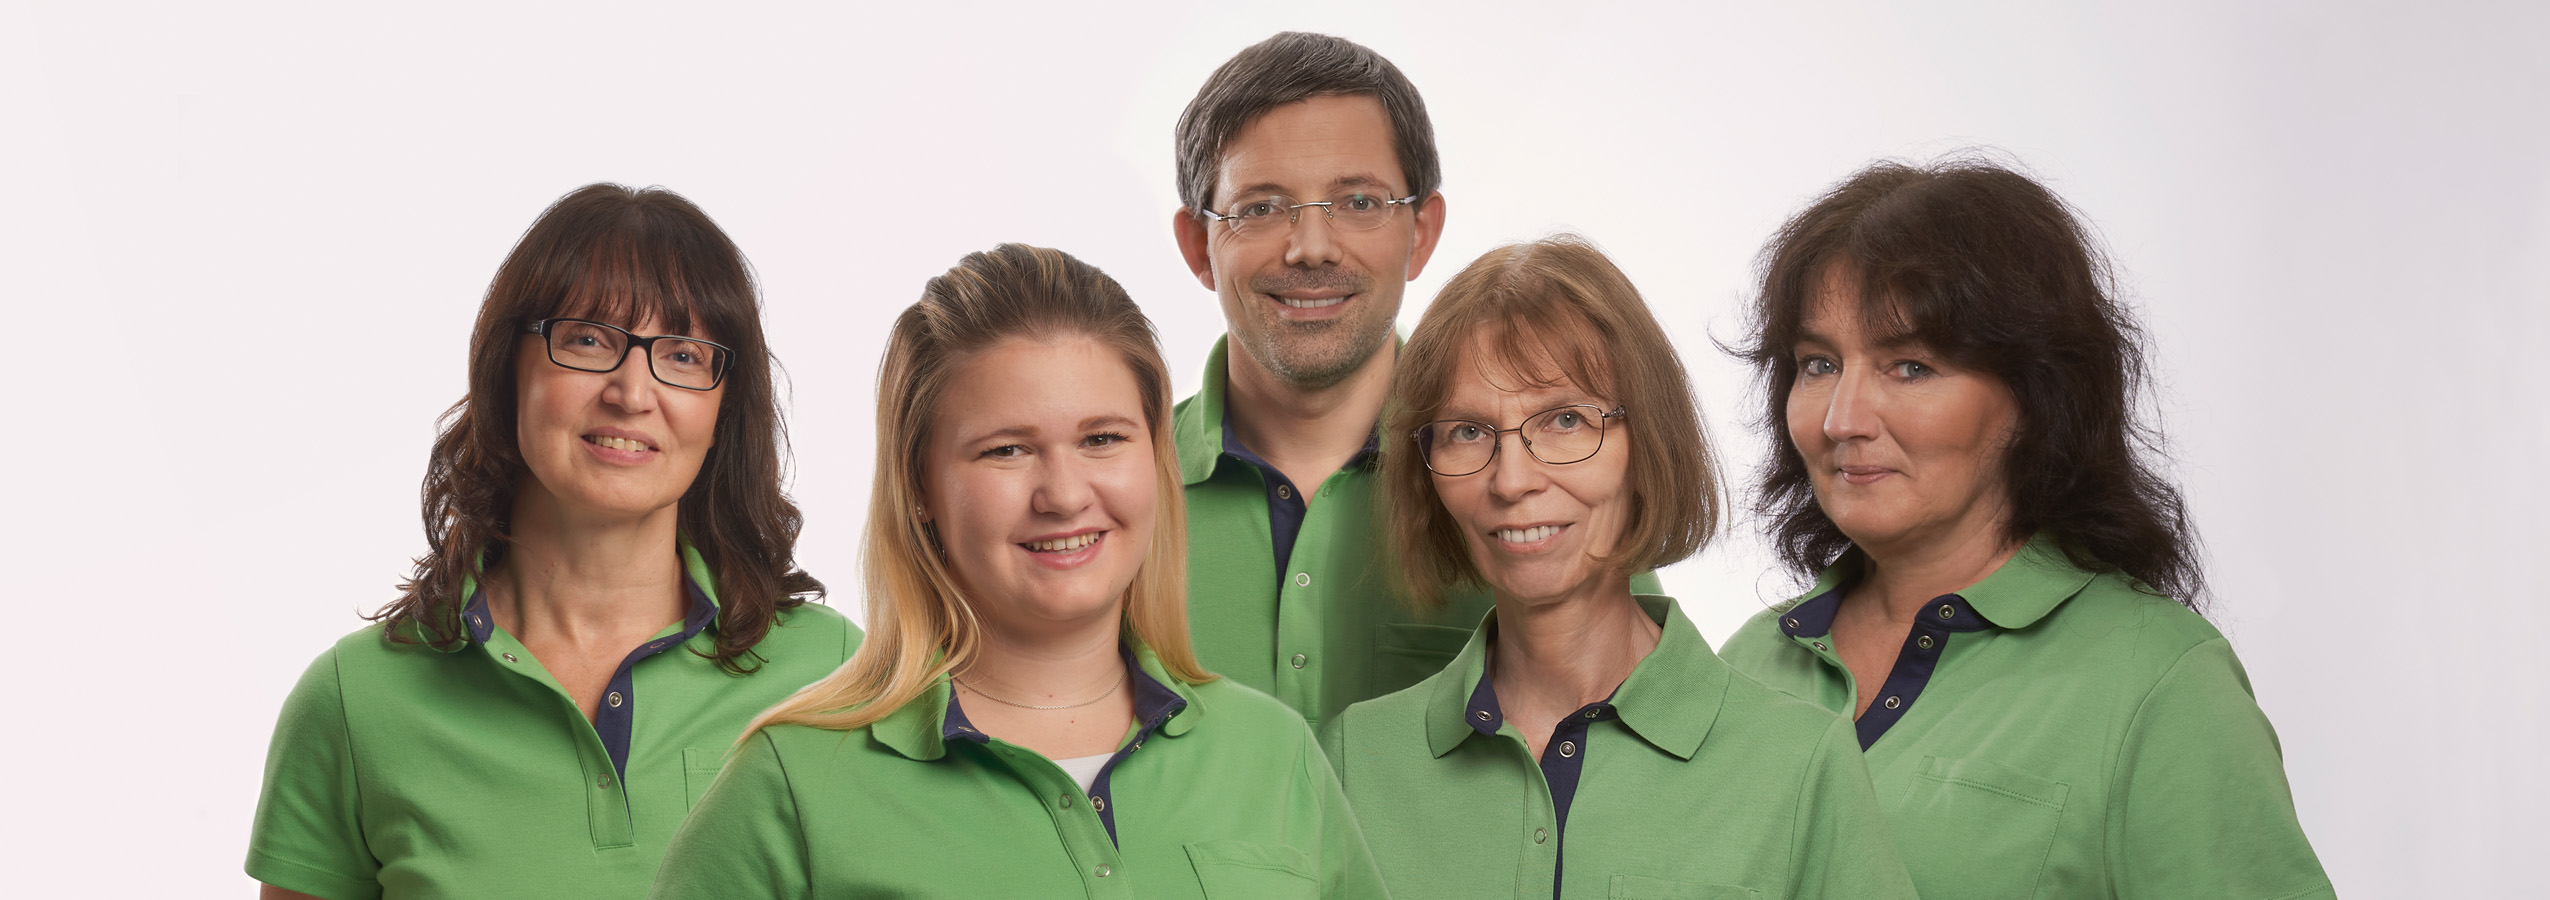 Praxis Hinzpeter Team